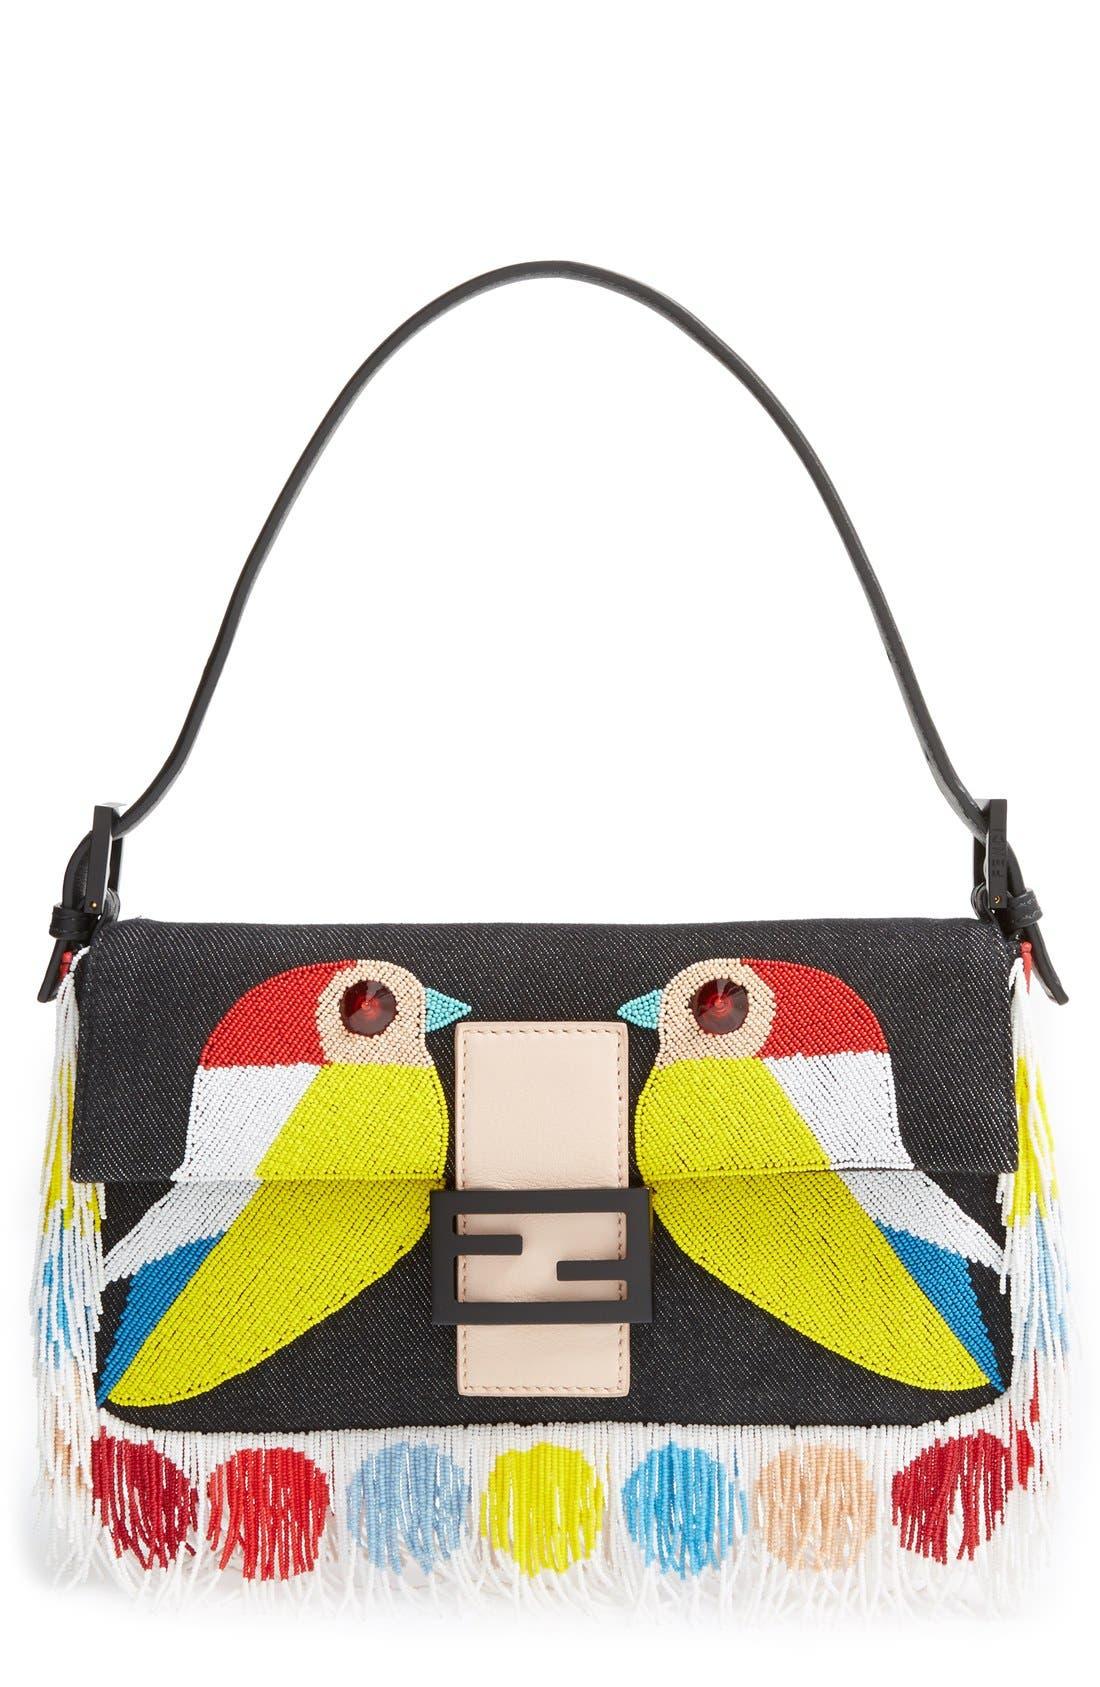 Main Image - Fendi 'Bird' Beaded Baguette